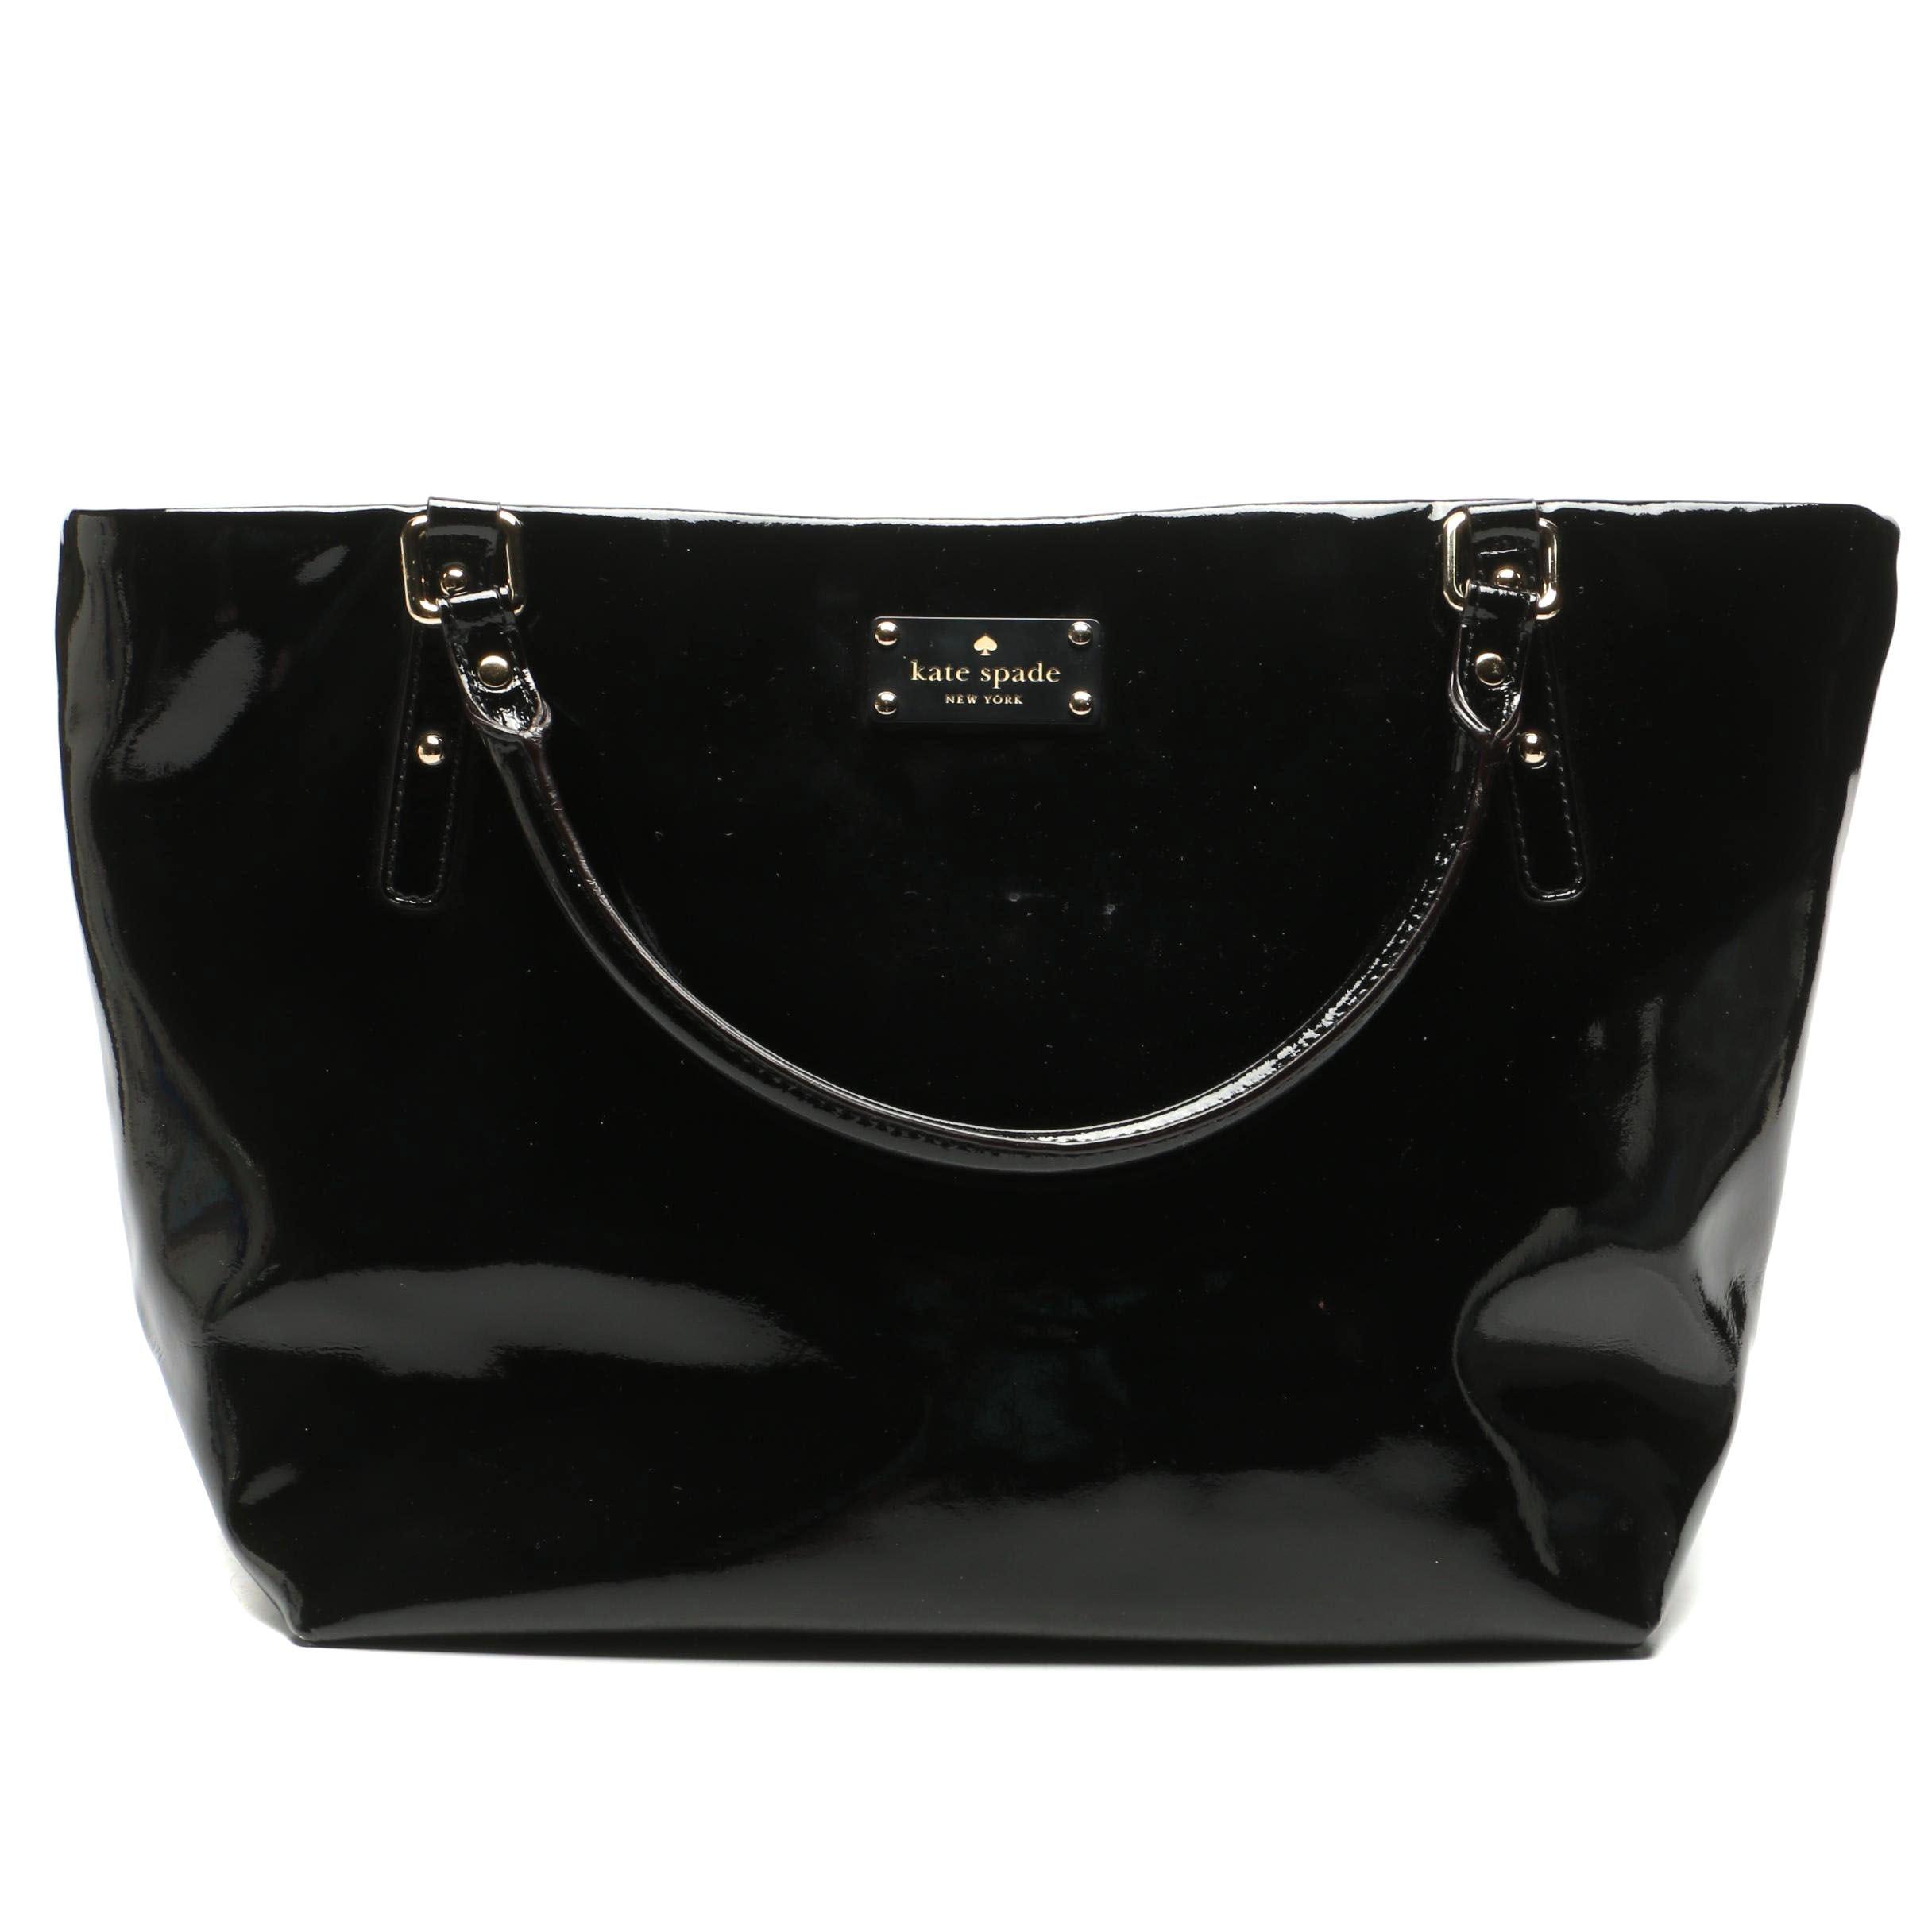 Kate Spade New York Jackson Square Sophie Black Patent Leather Tote Bag